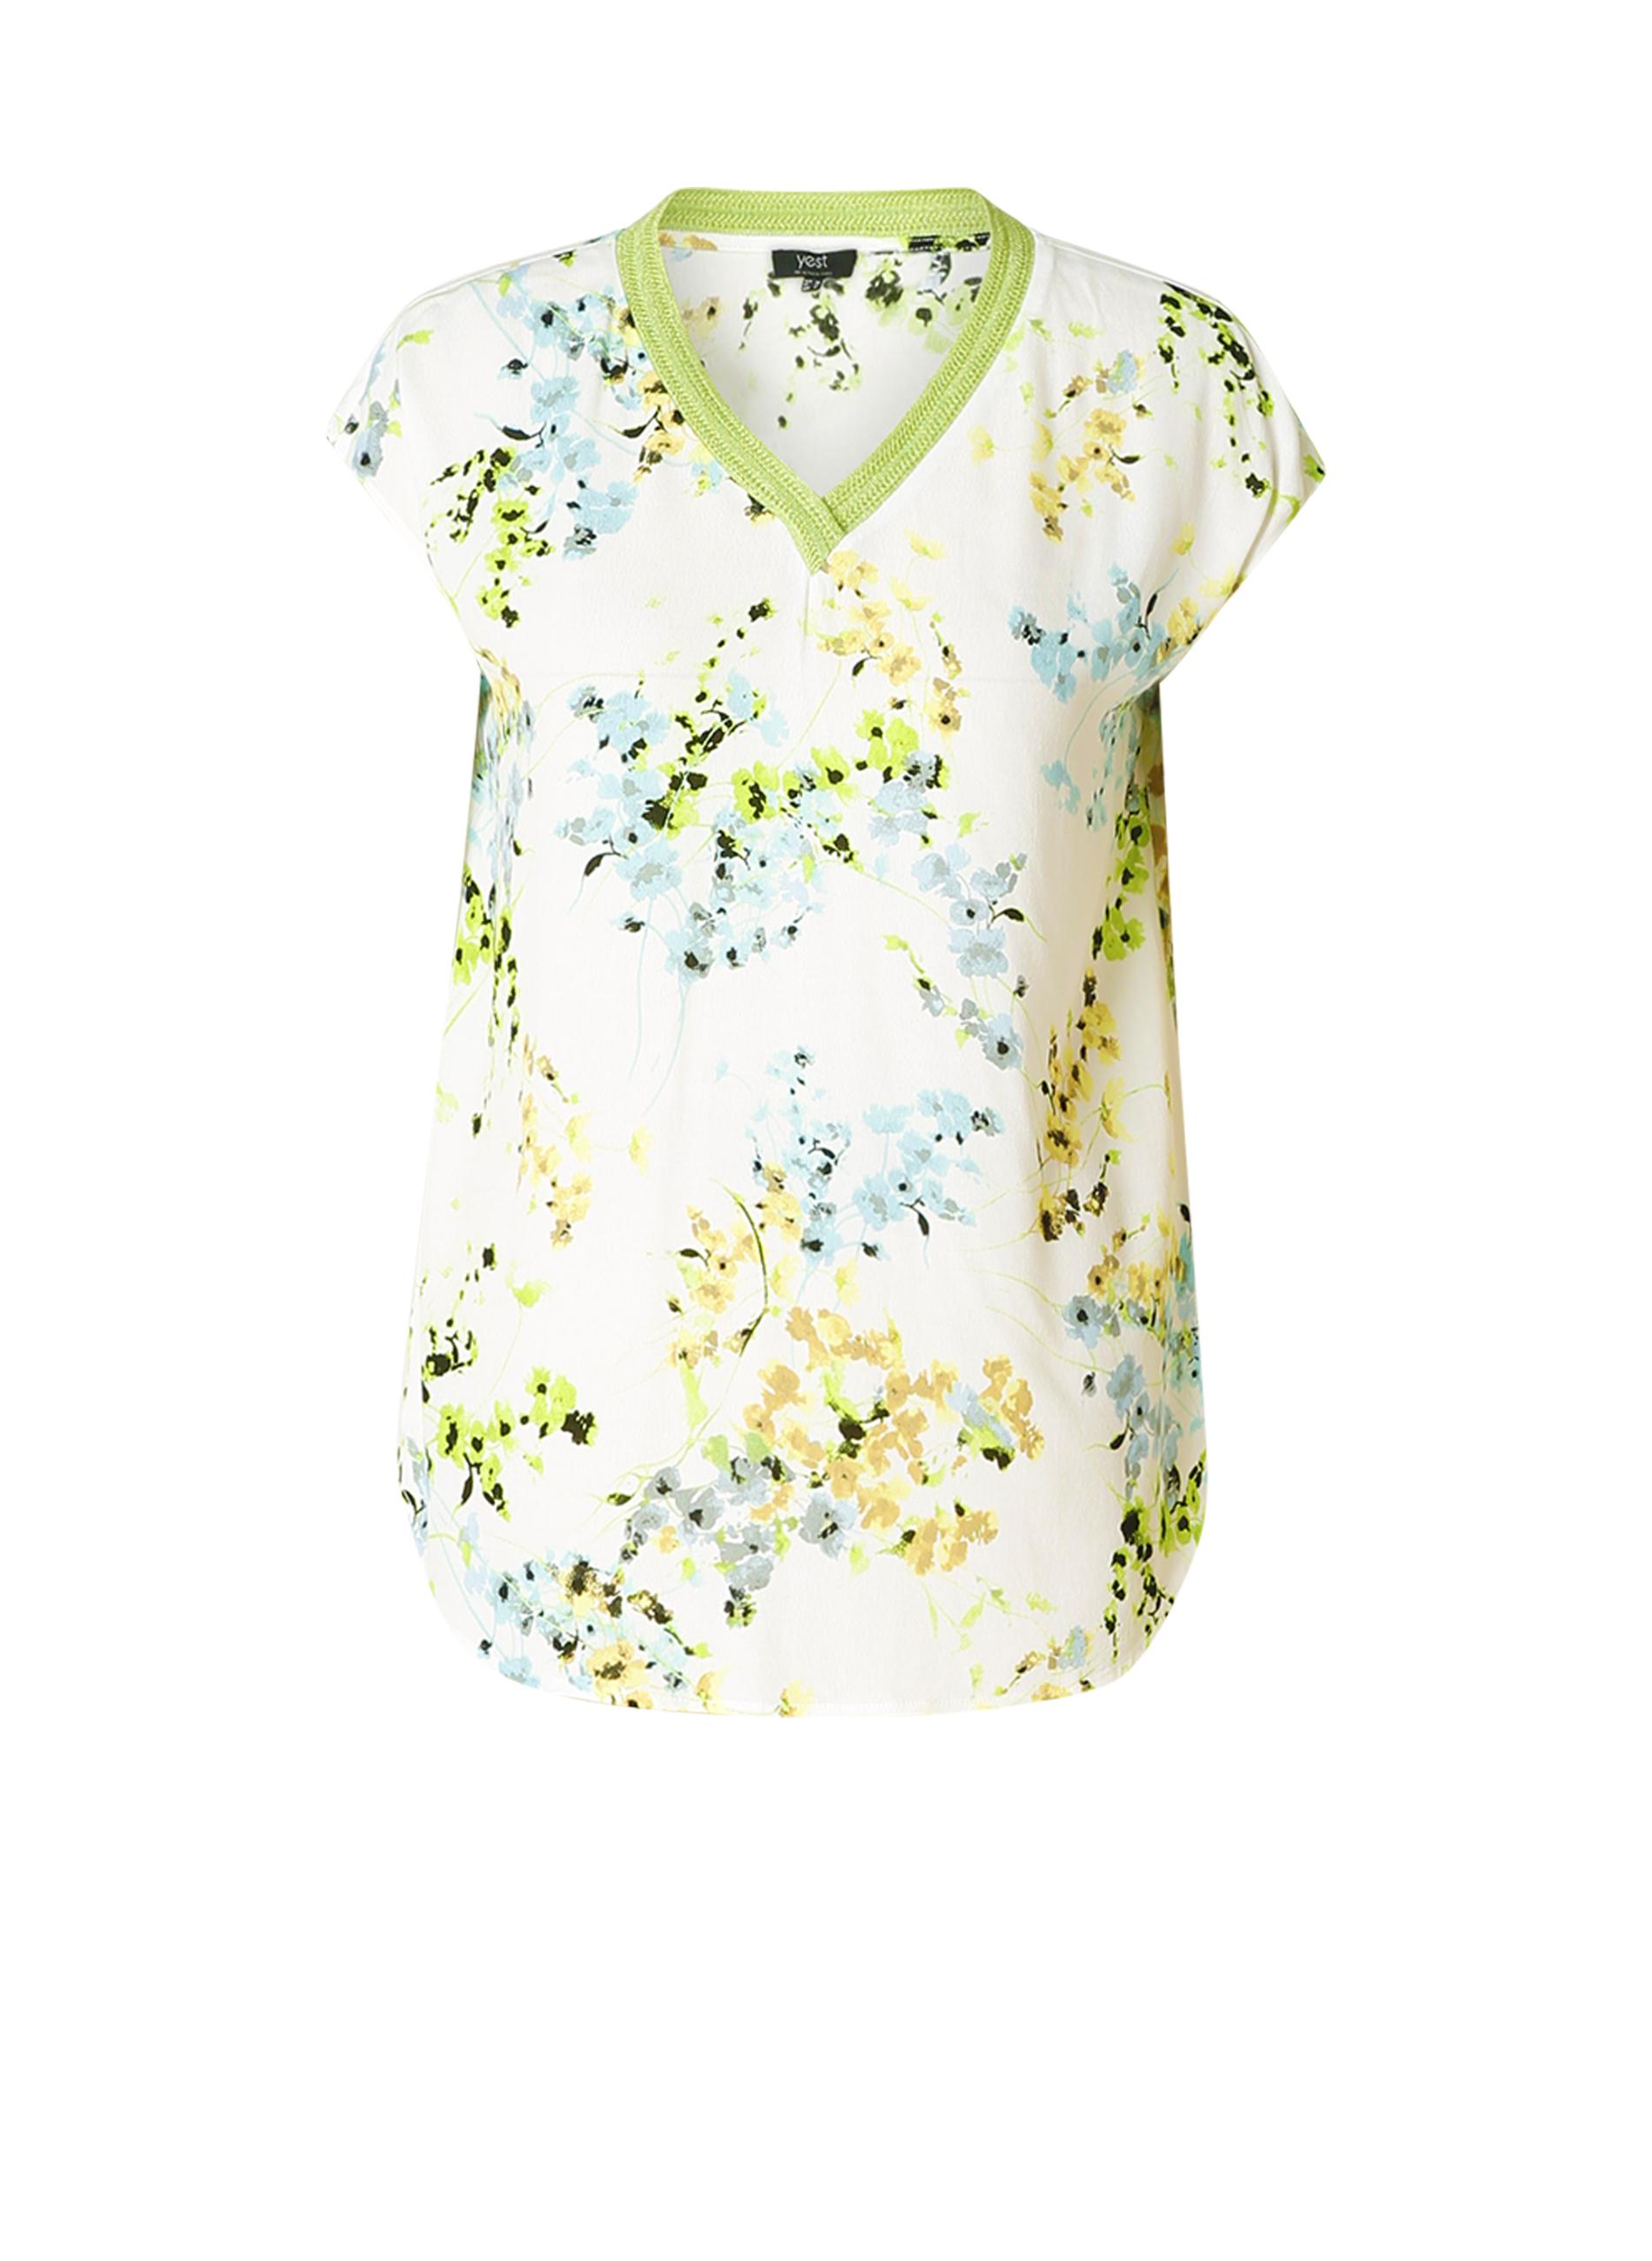 Yesta blouse Lailani 80 cm